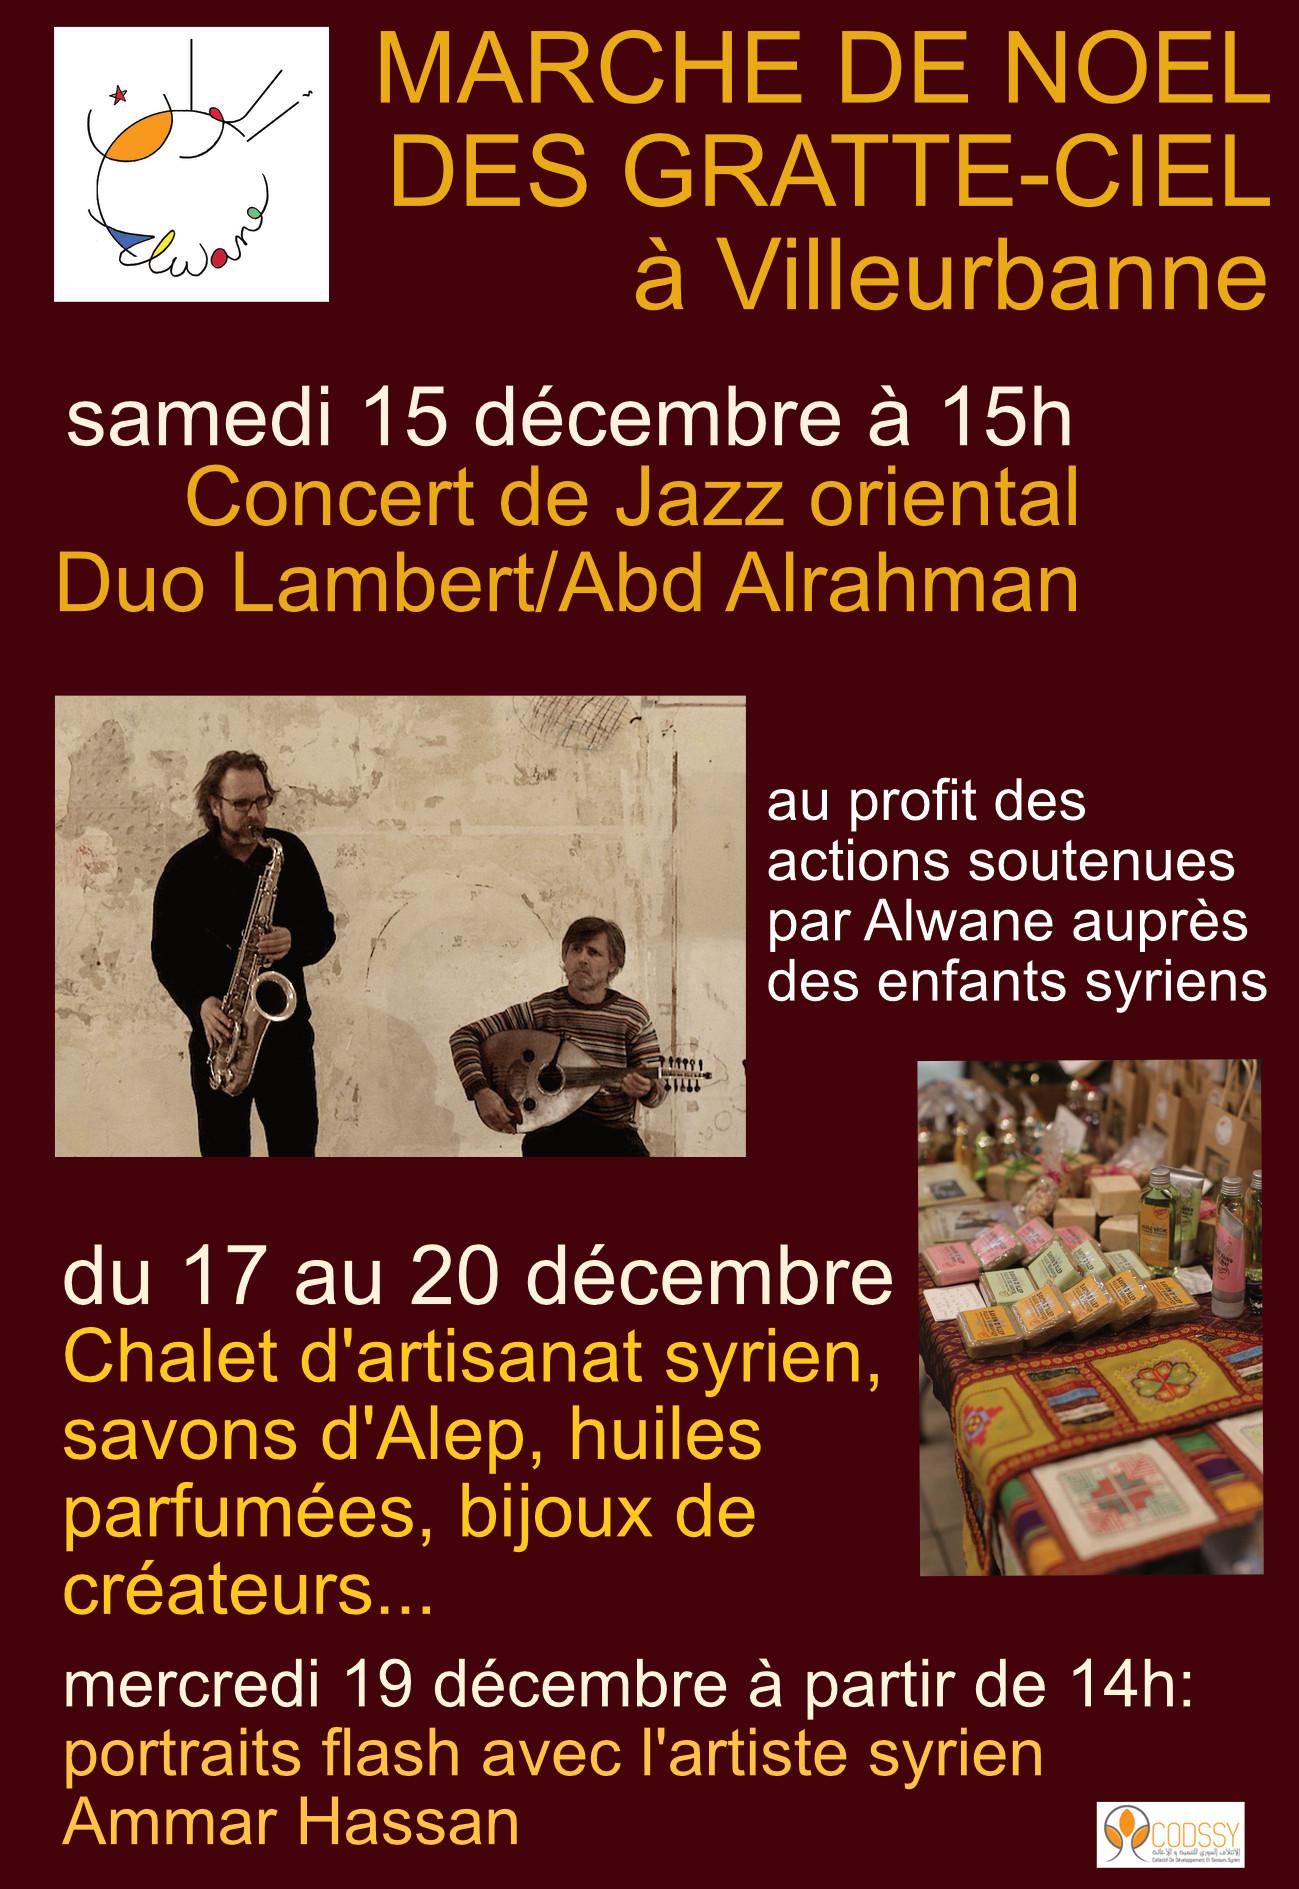 Concert Duo Lambert/Abd Alrahman au Marché de Noël de Villeurbanne